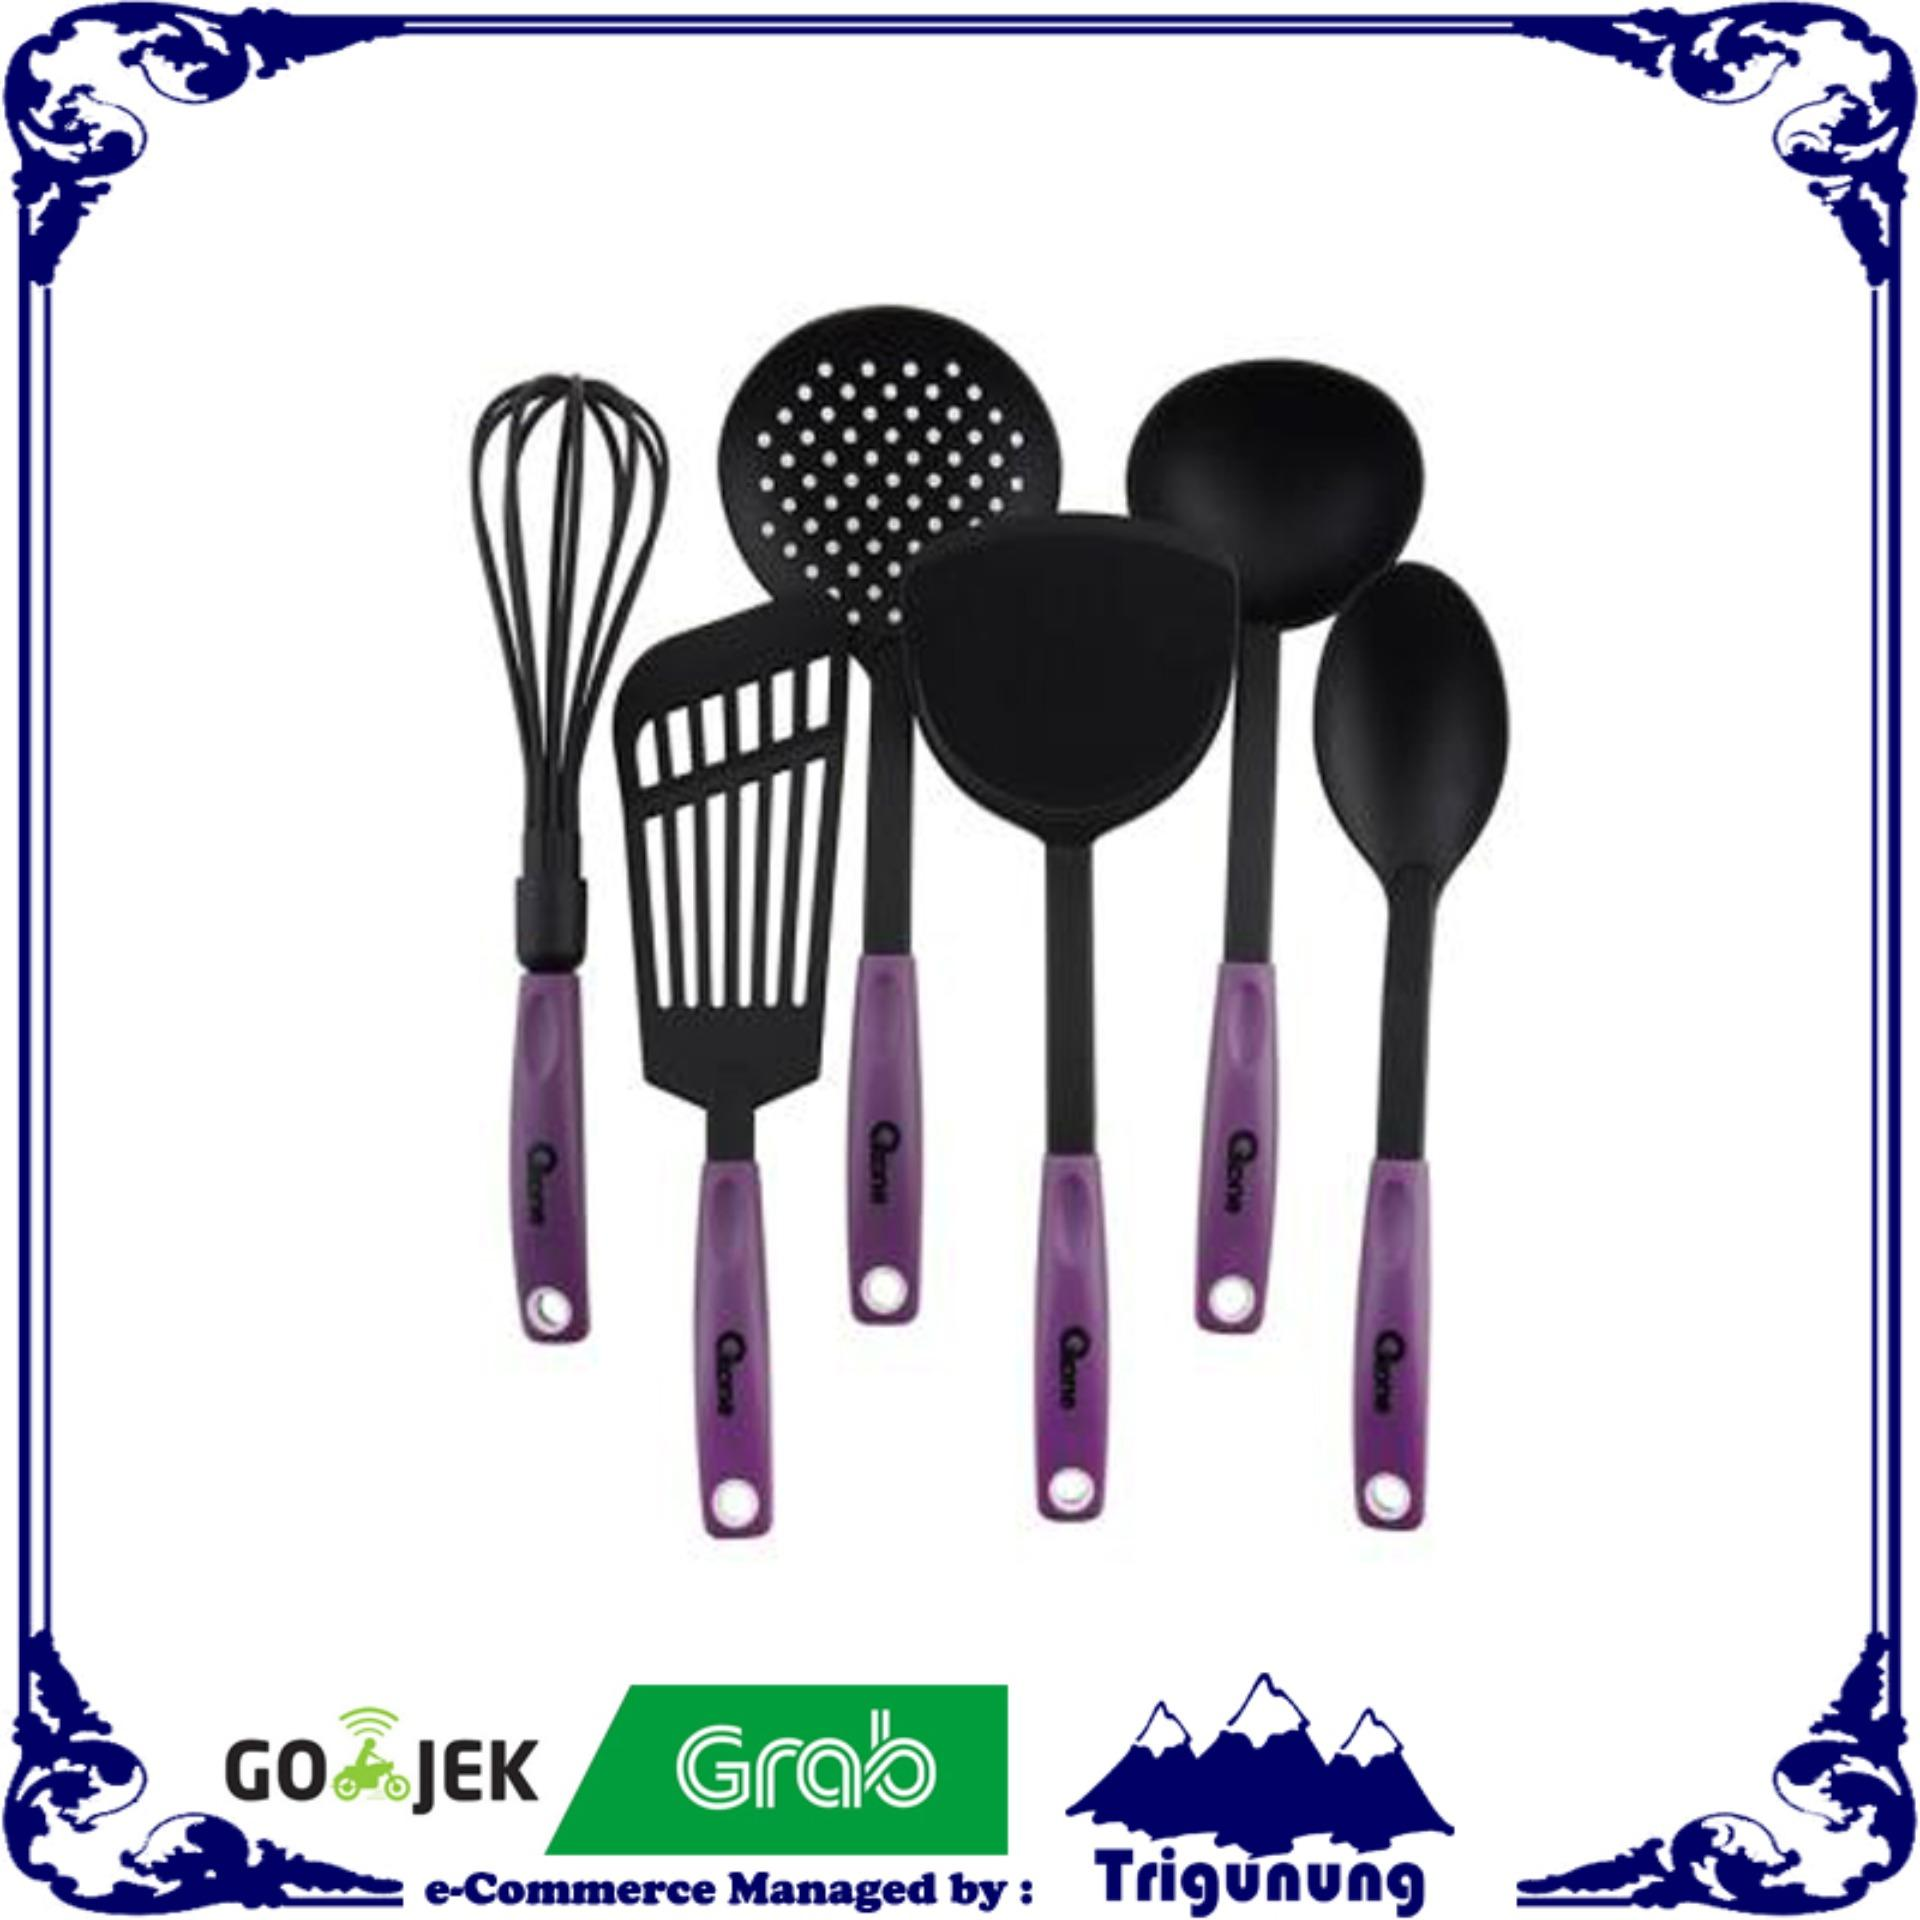 Beli Murah Harga Diskon Teflon Maspion 2 Pcs Fry Pan Set Non Stick Frypan Oxone Ox 953 Kitchen Tools 6